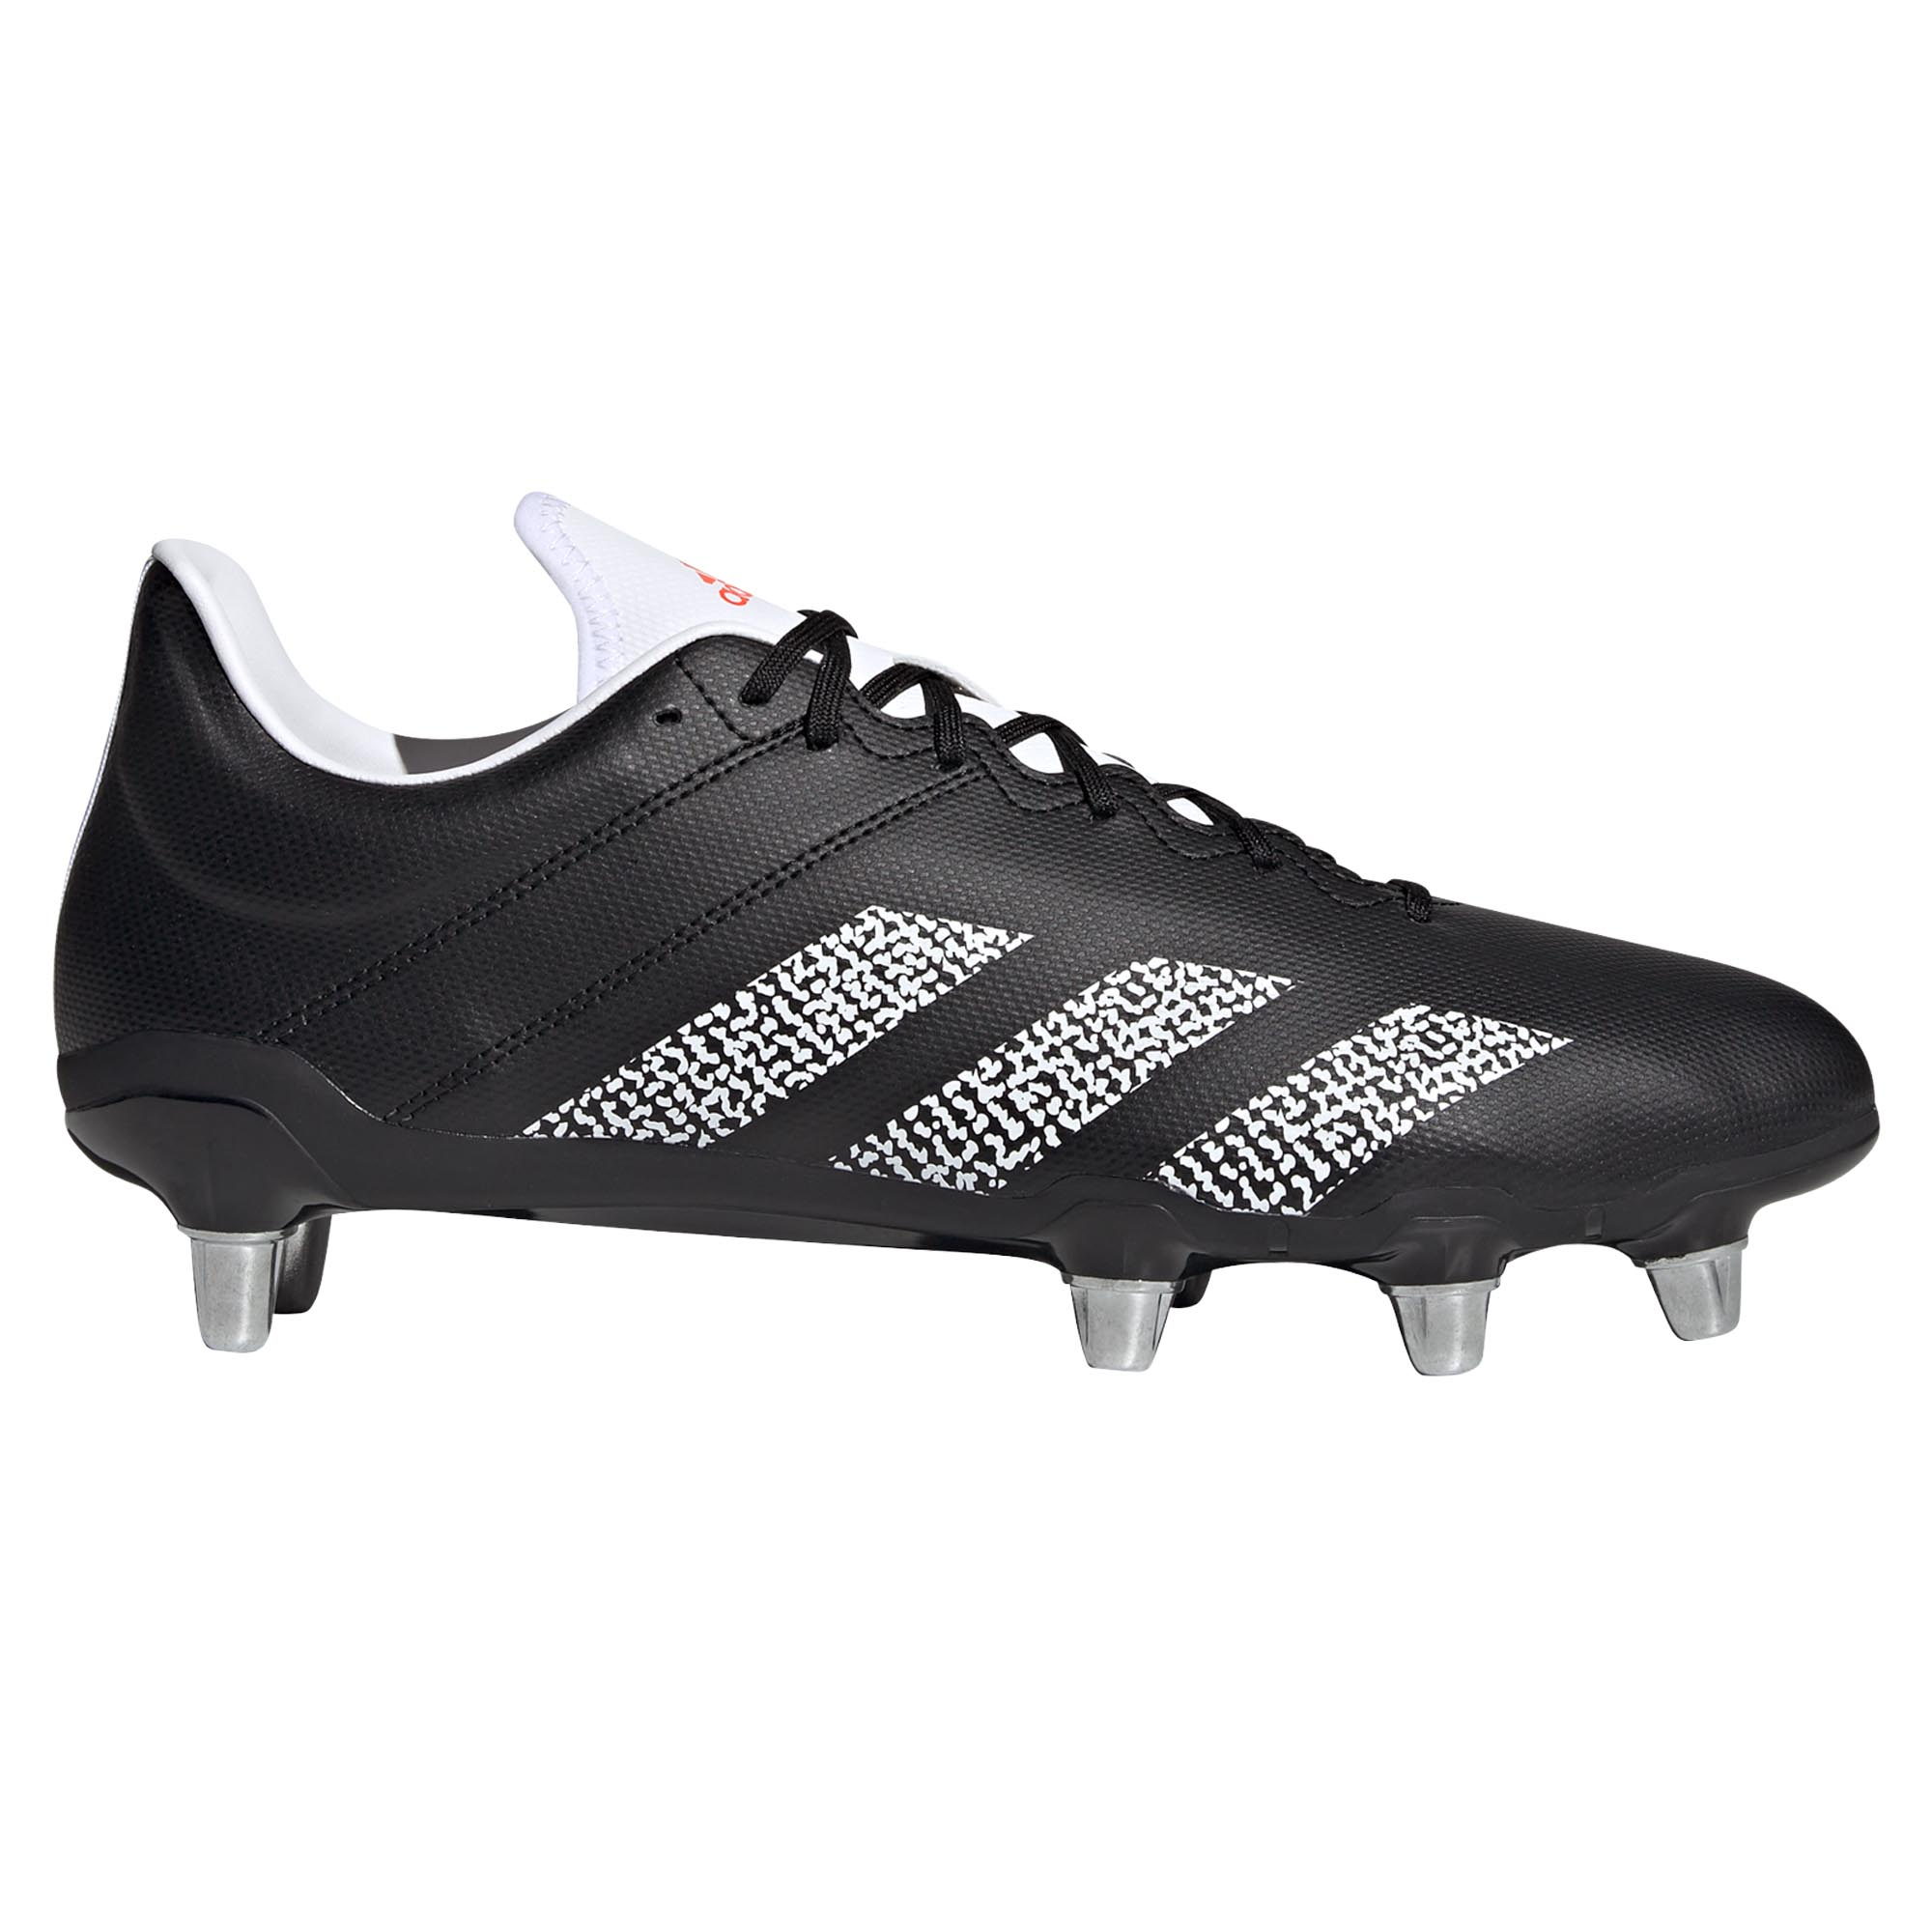 miniature 5 - Adidas Kakari SG Terrain Souple Adulte Unisexe Rugby Union Boot Noir/Blanc